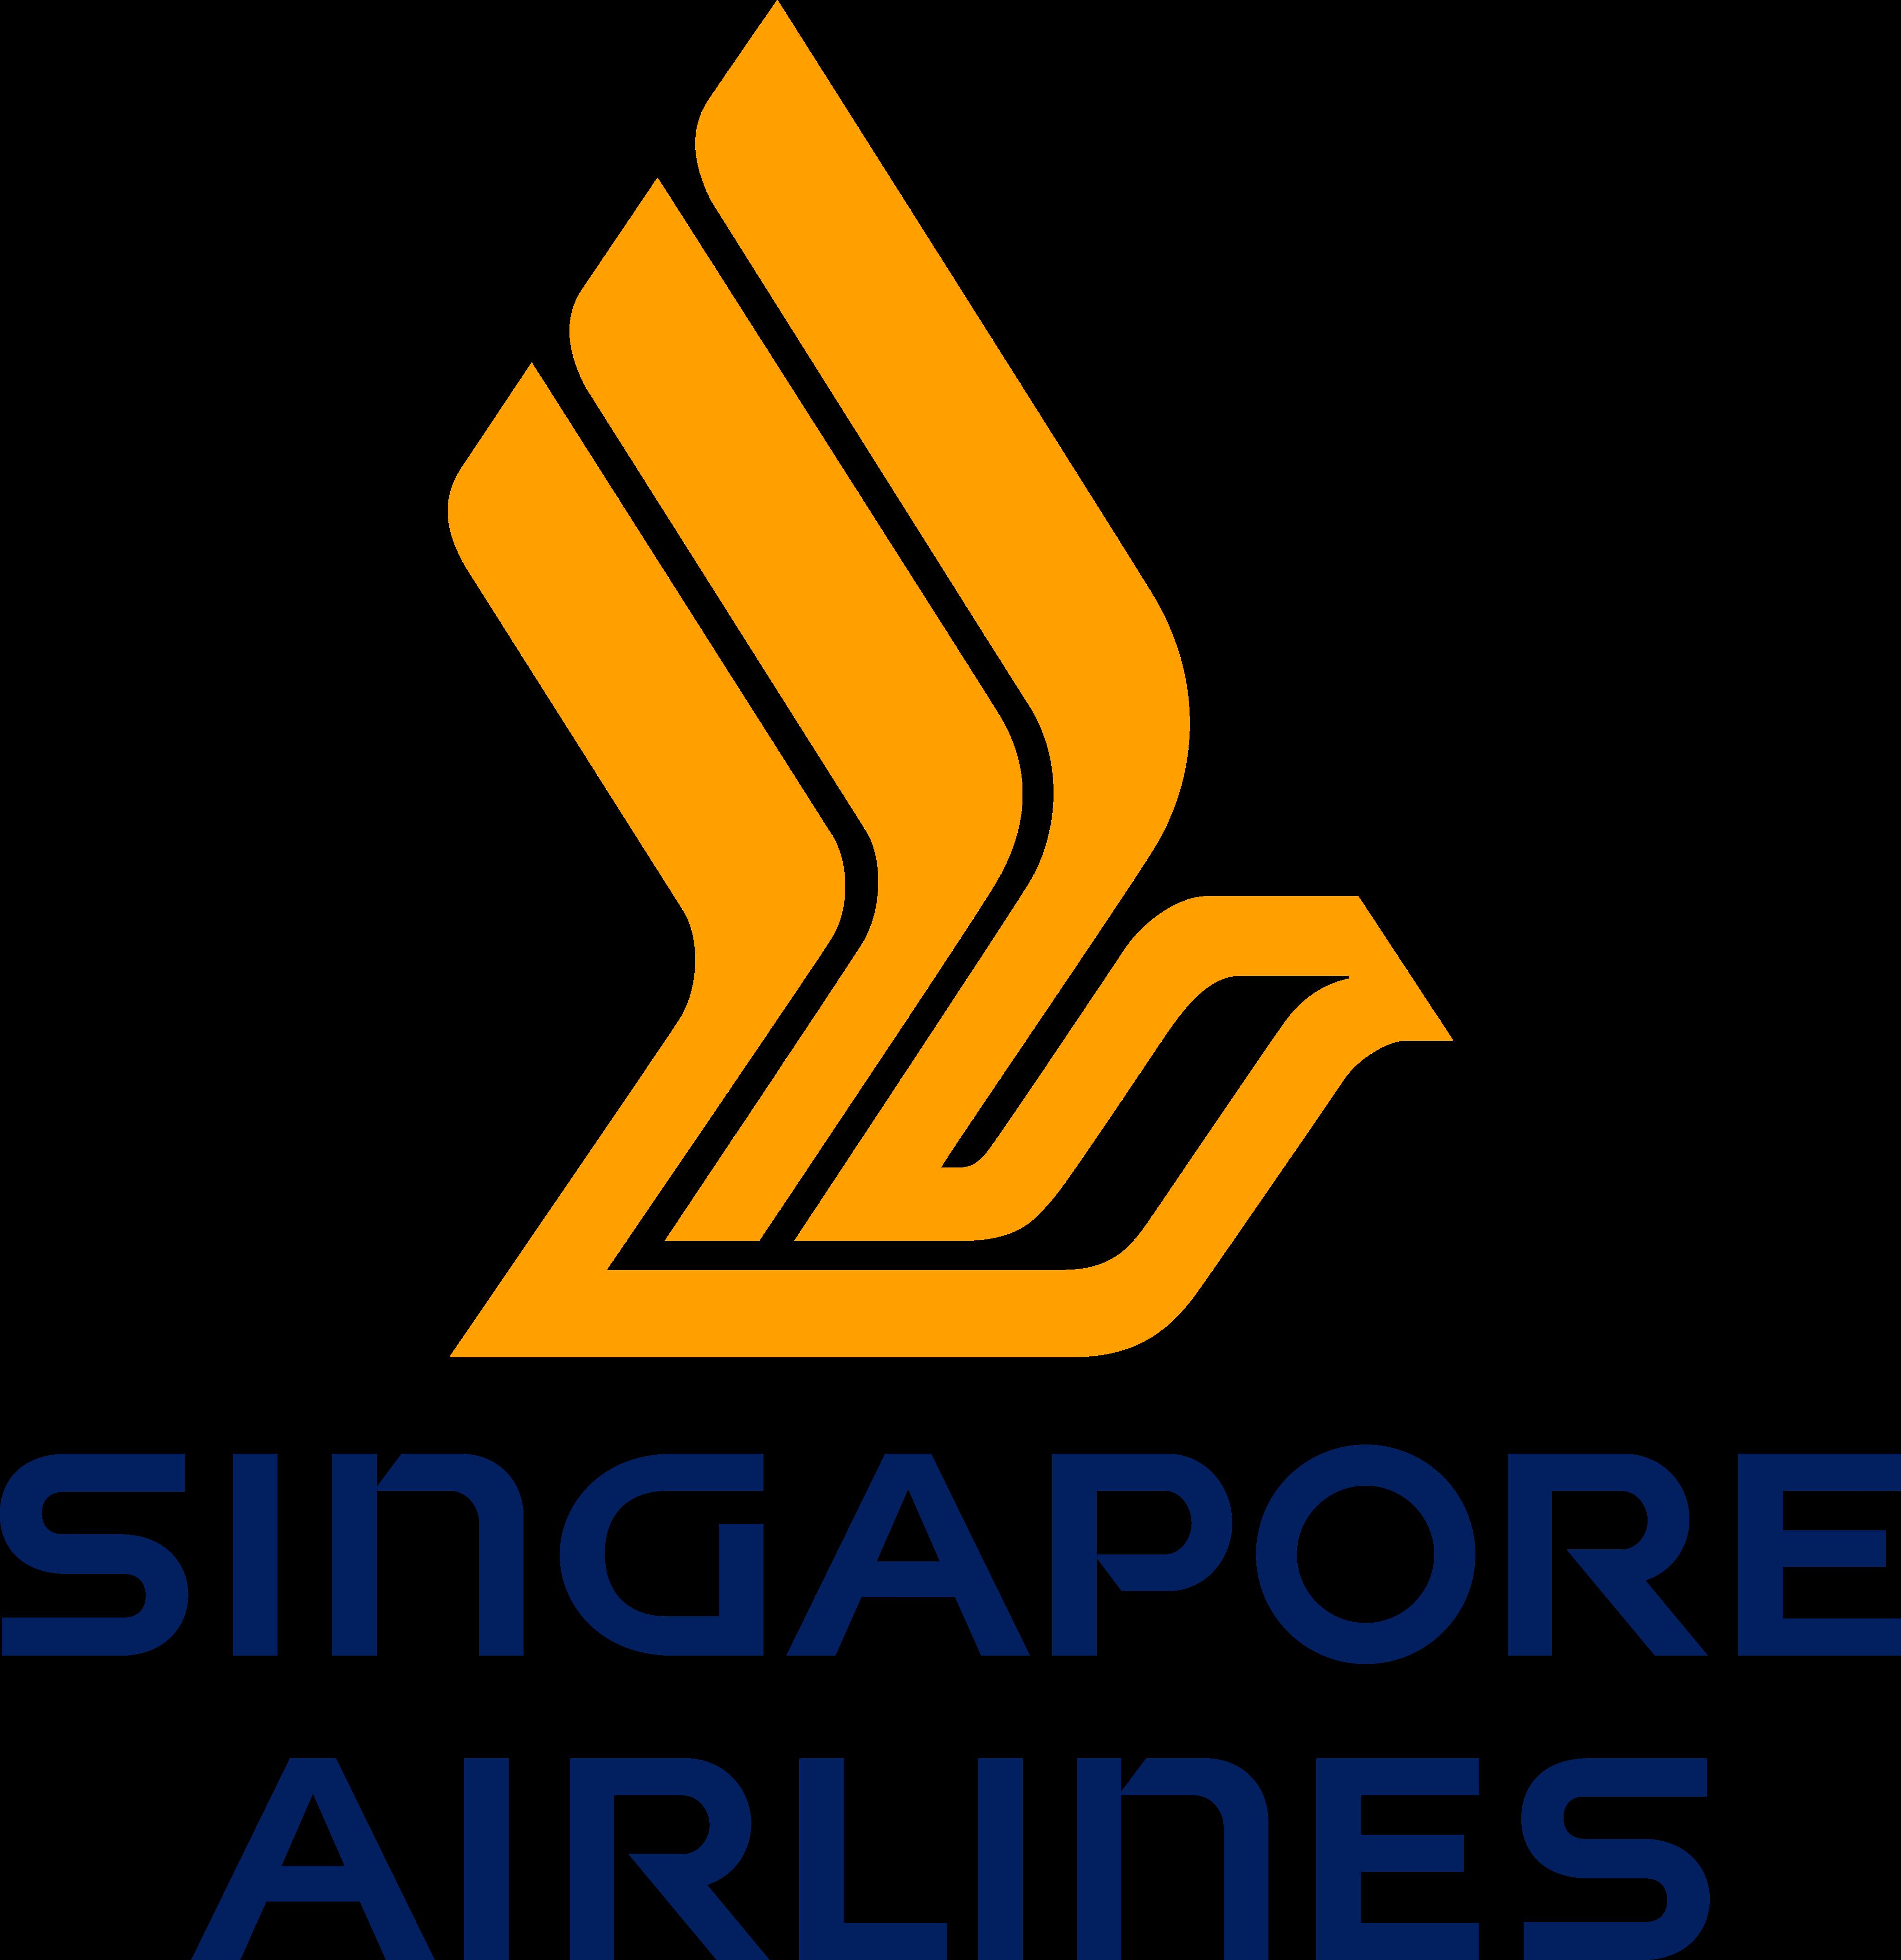 singapore airlines logo 1 - Singapore Airlines Logo